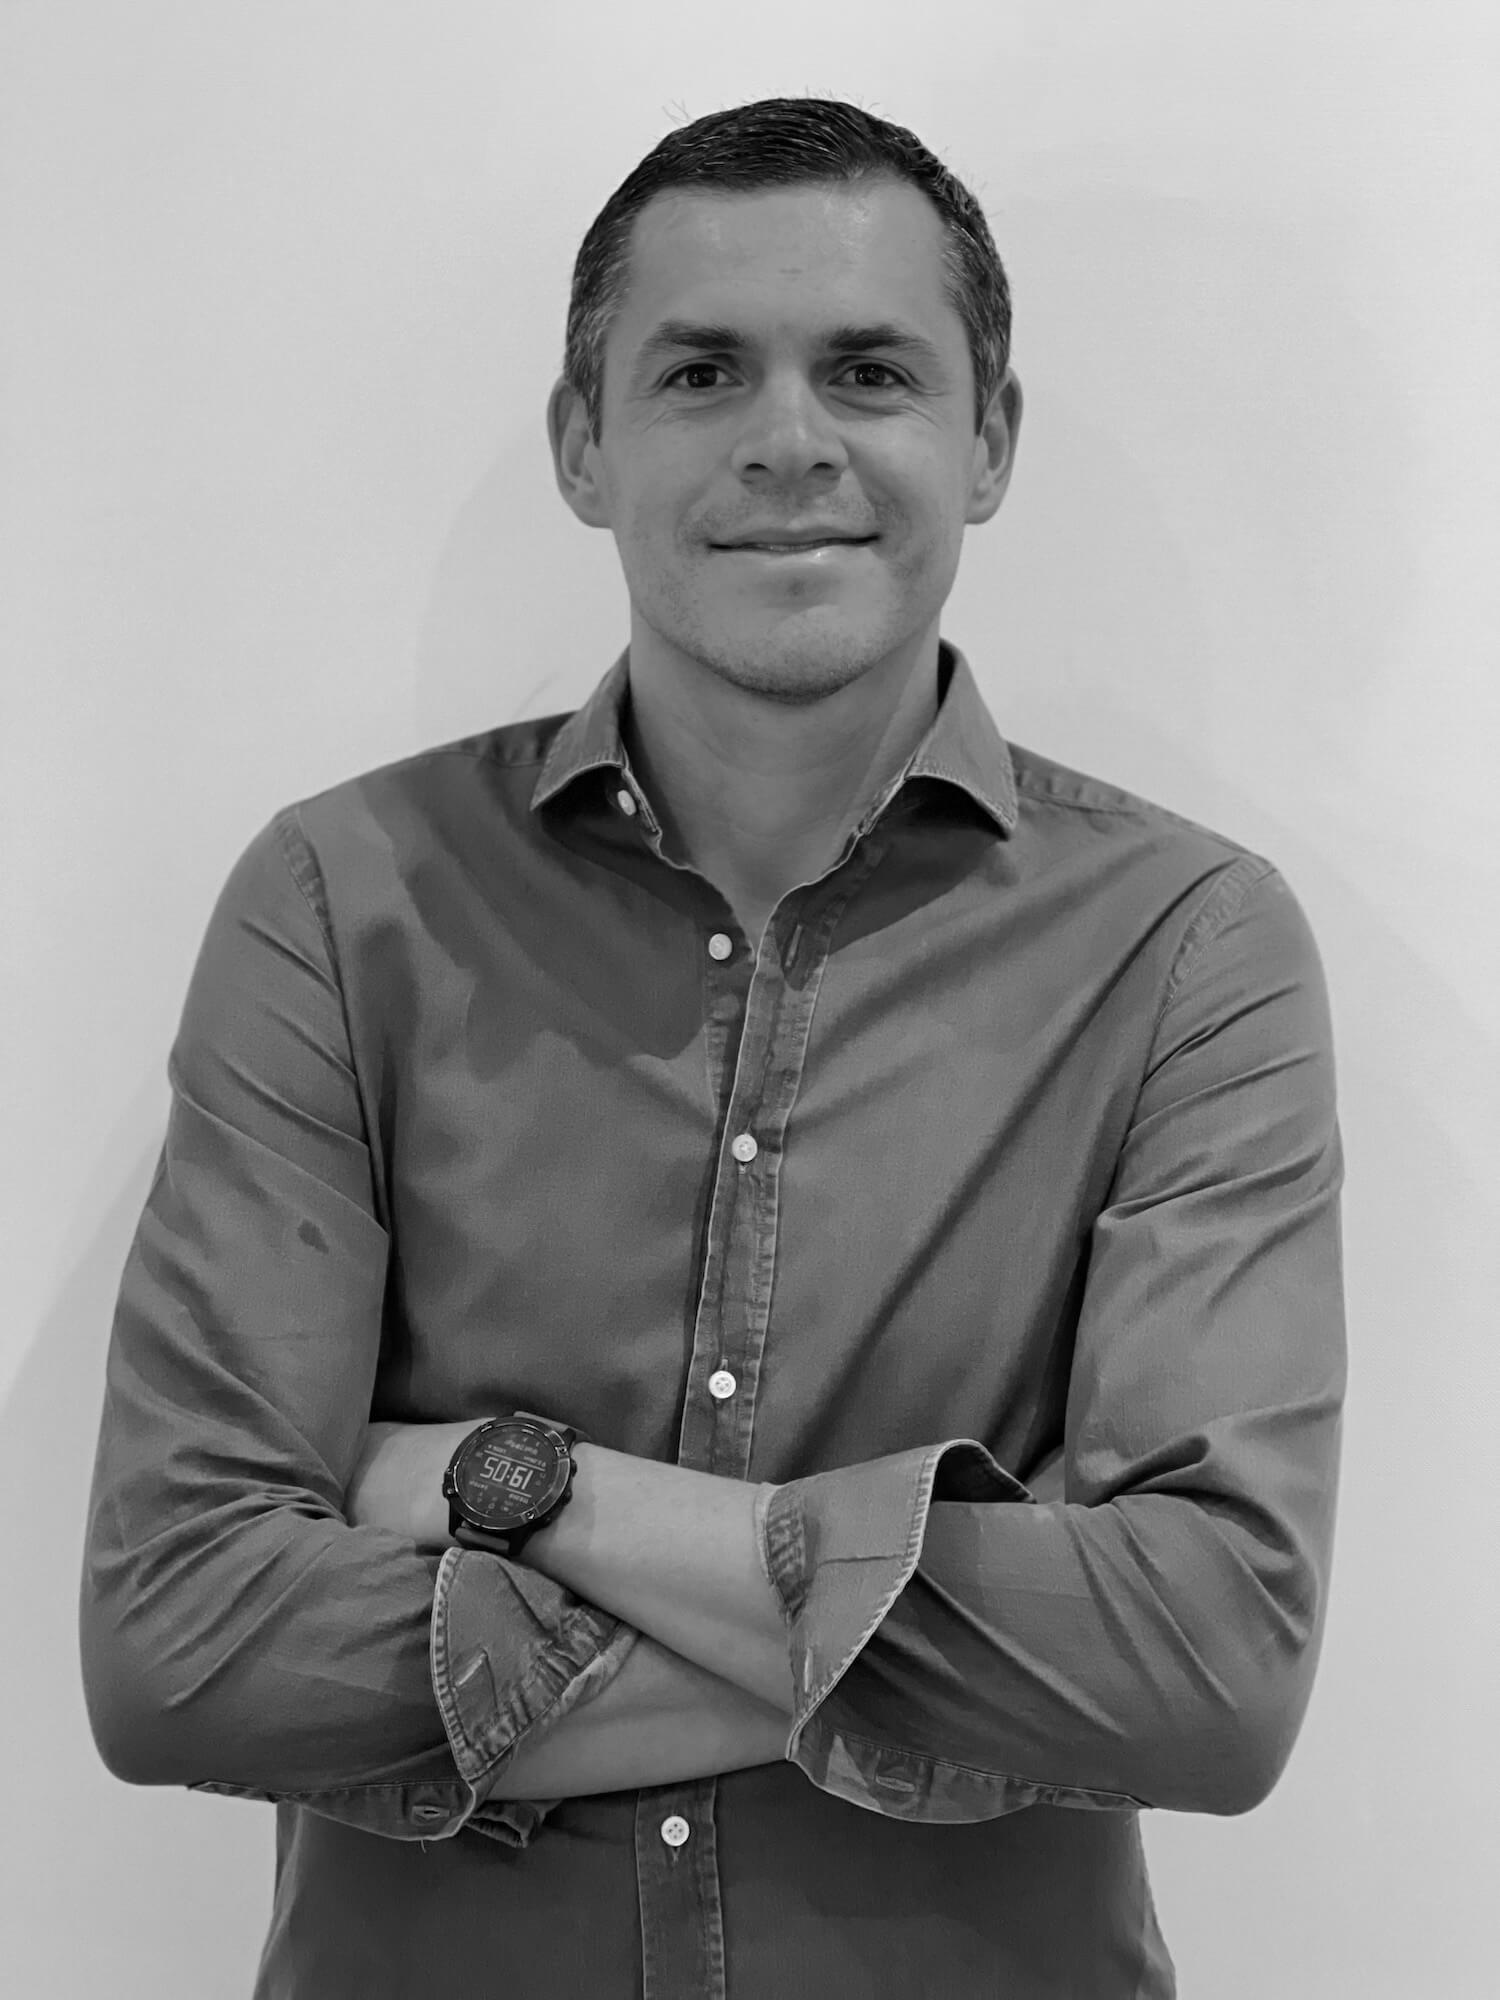 Jens Thobo-Carlsen